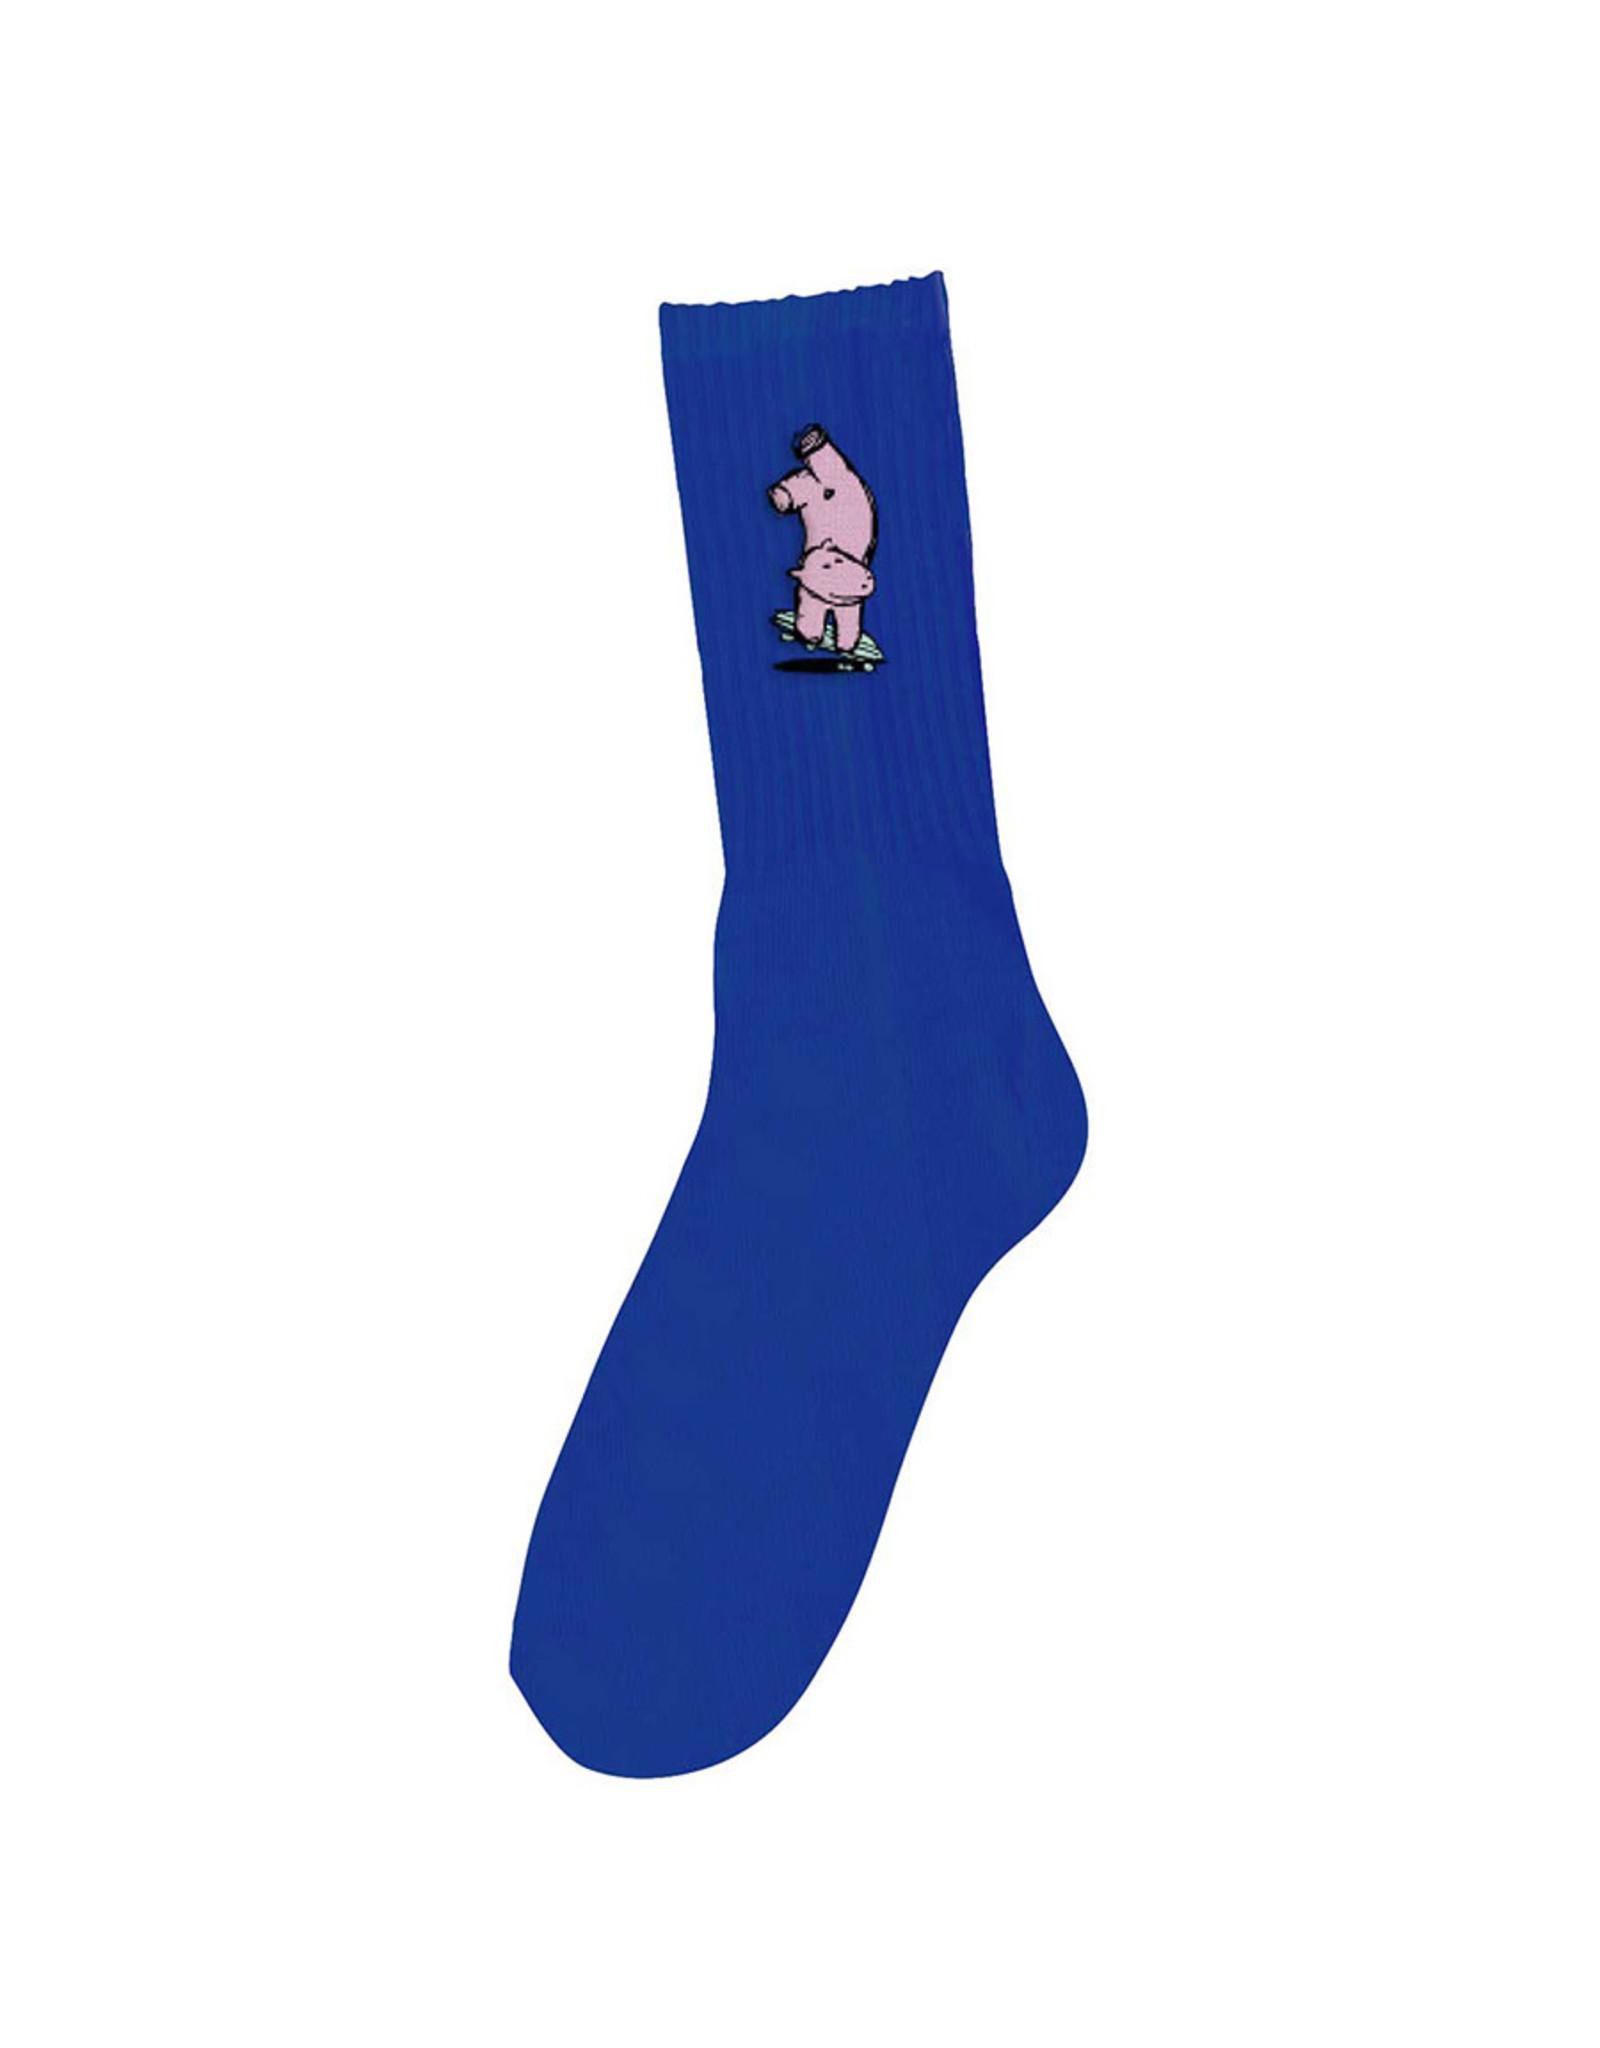 Foundation Foundation Socks Hippo Crew (Blue)